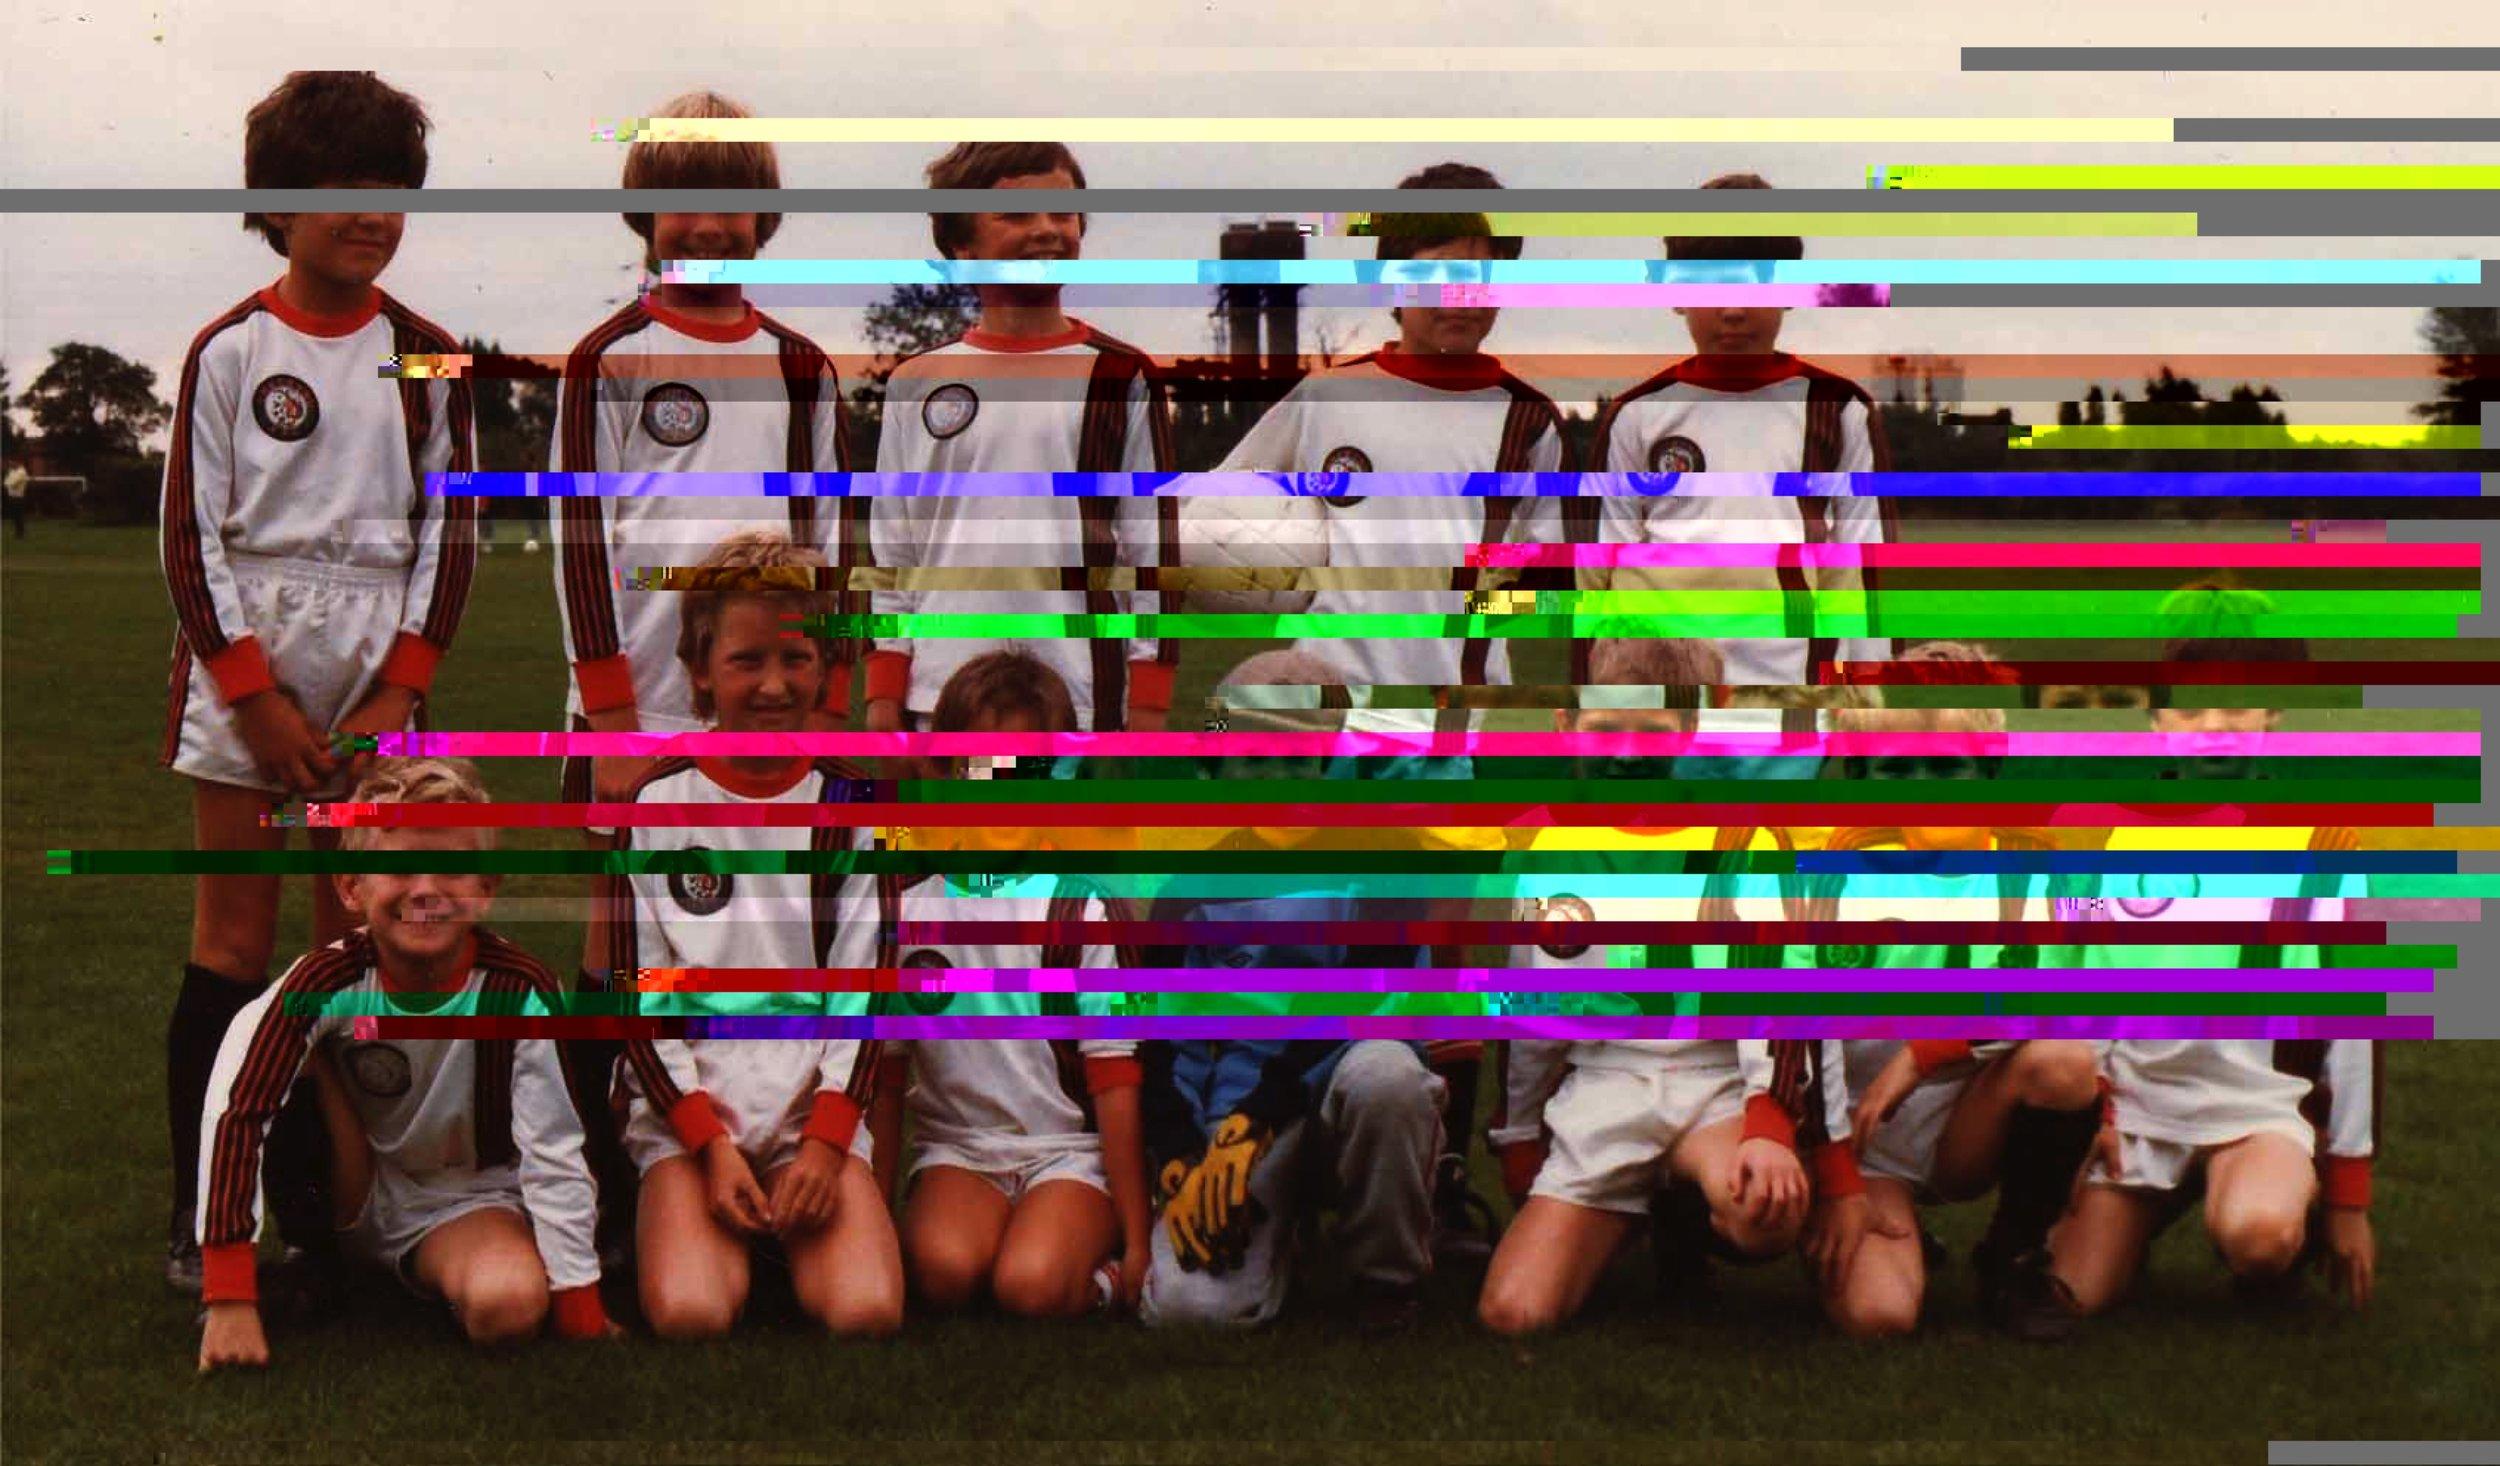 team copy_glitched.jpg